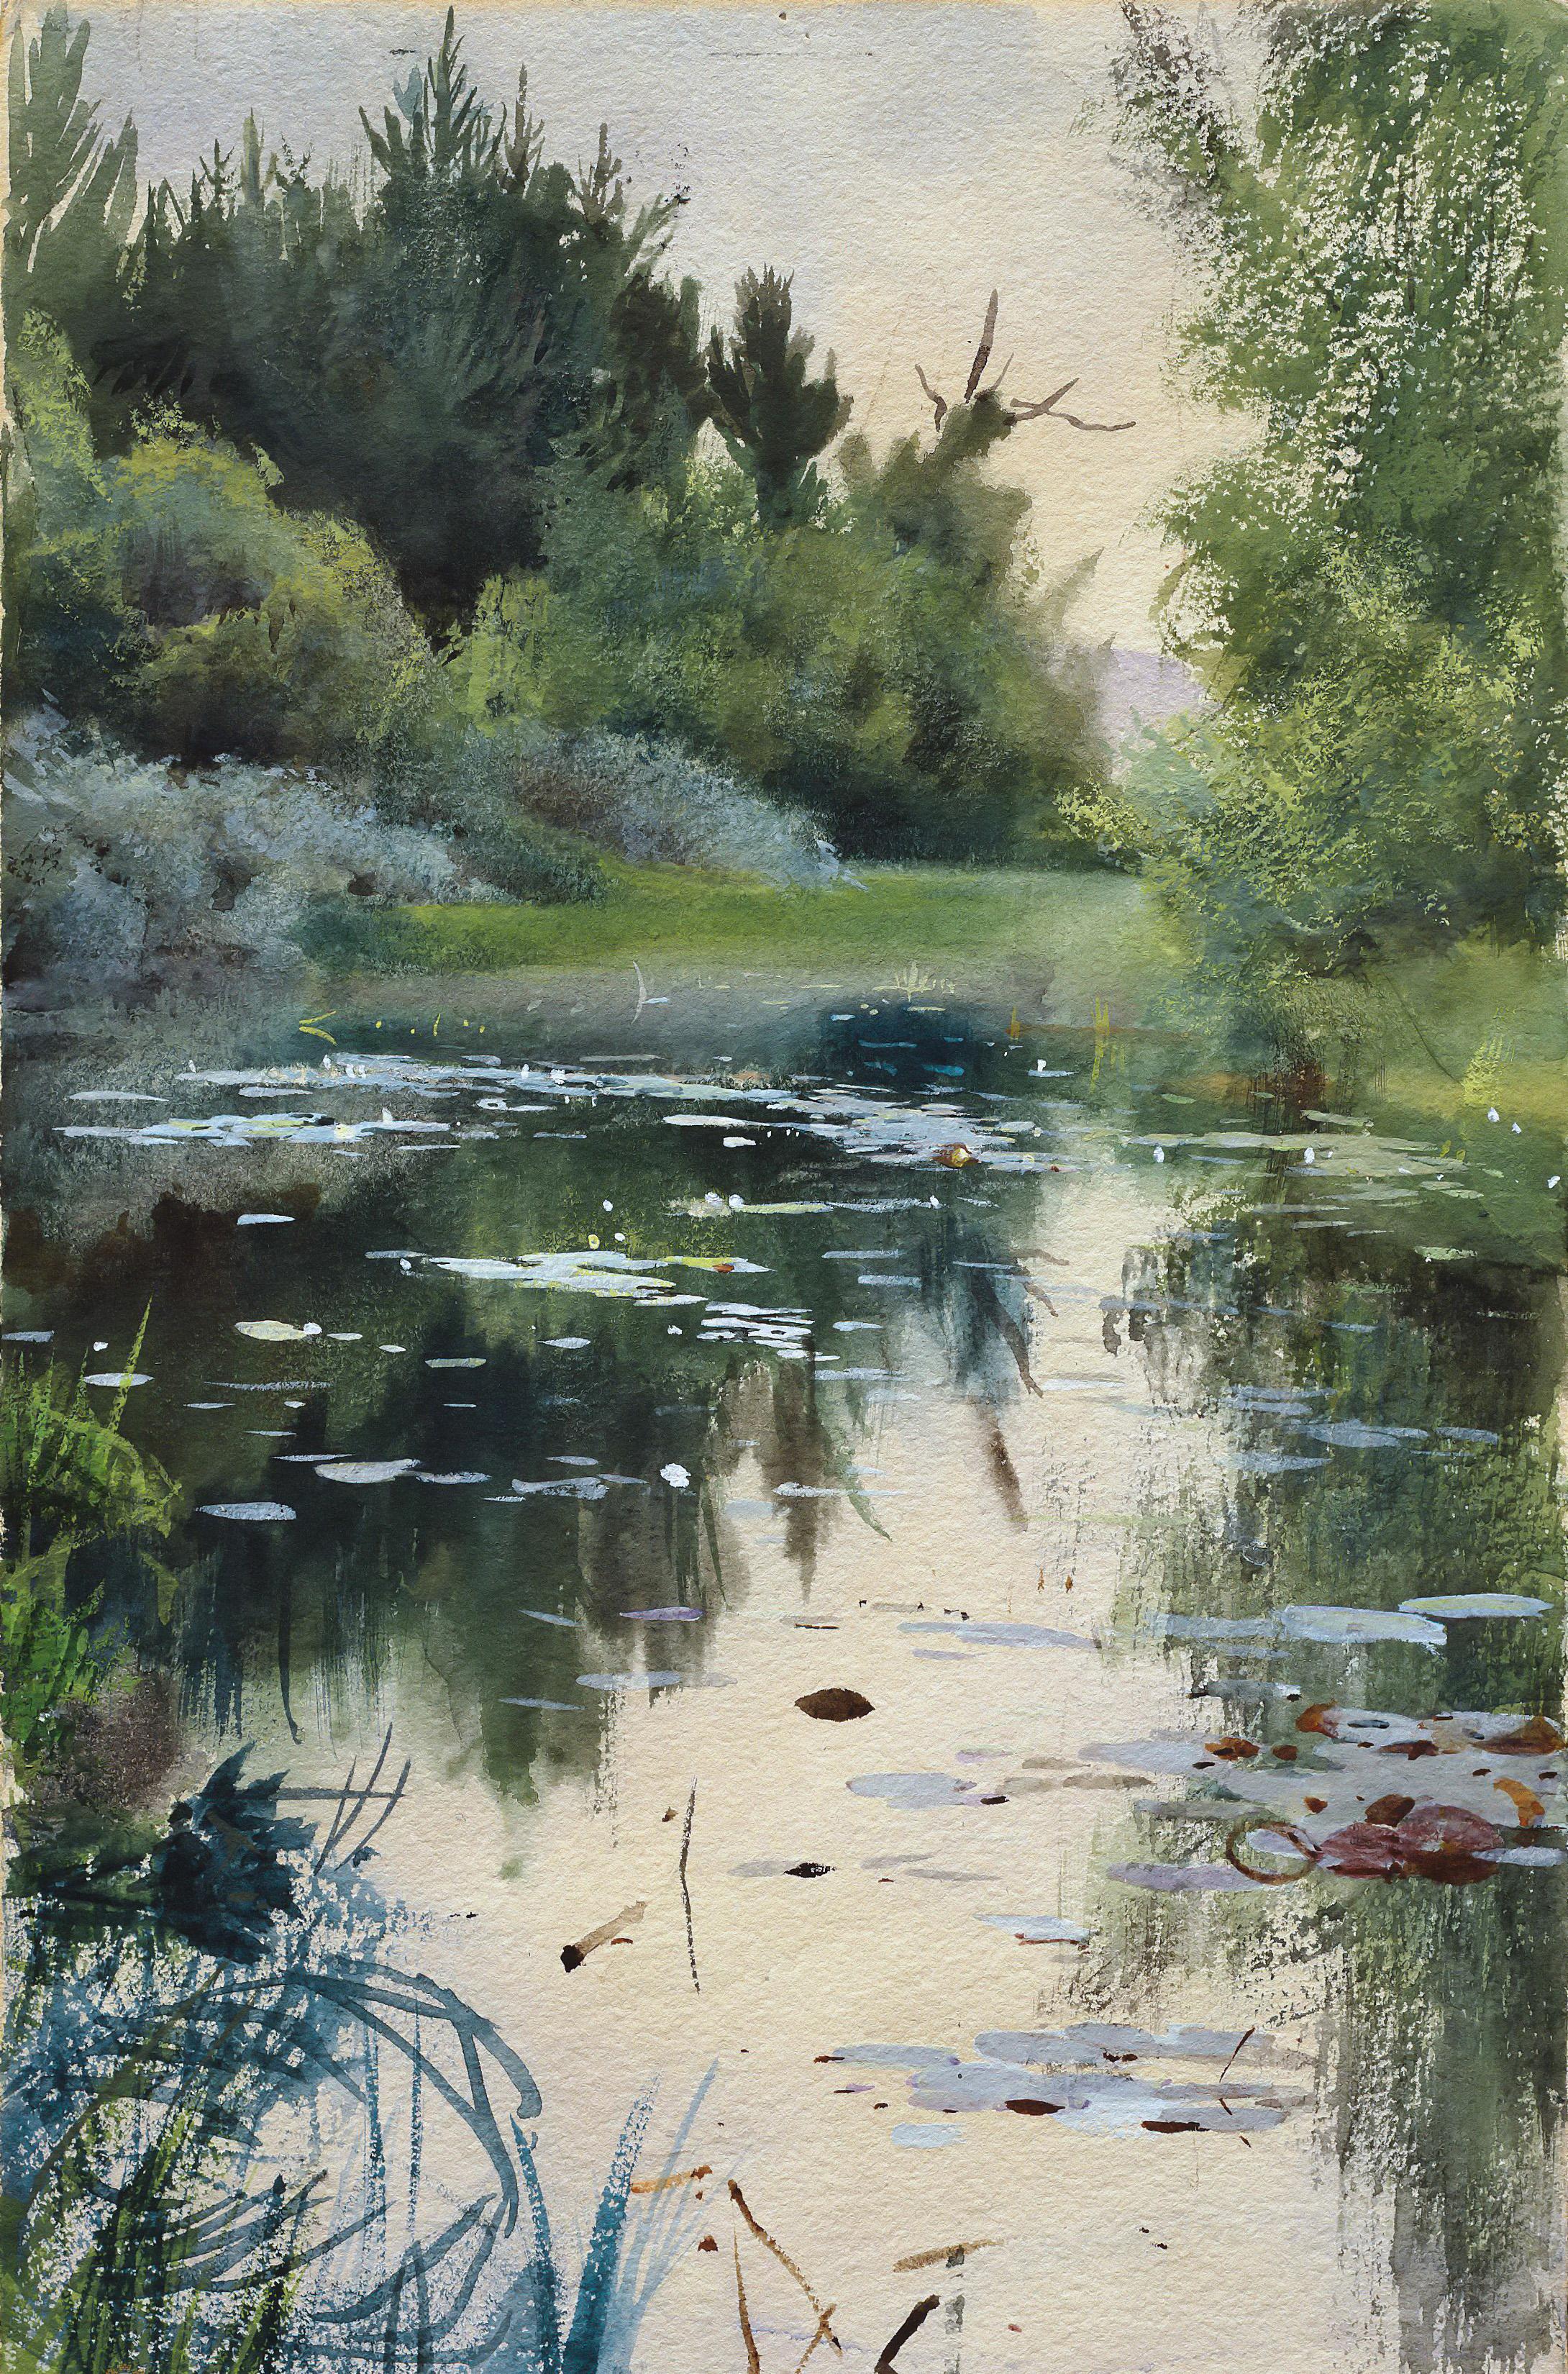 Андерс Цорн картина Пейзаж в Муре холст масло